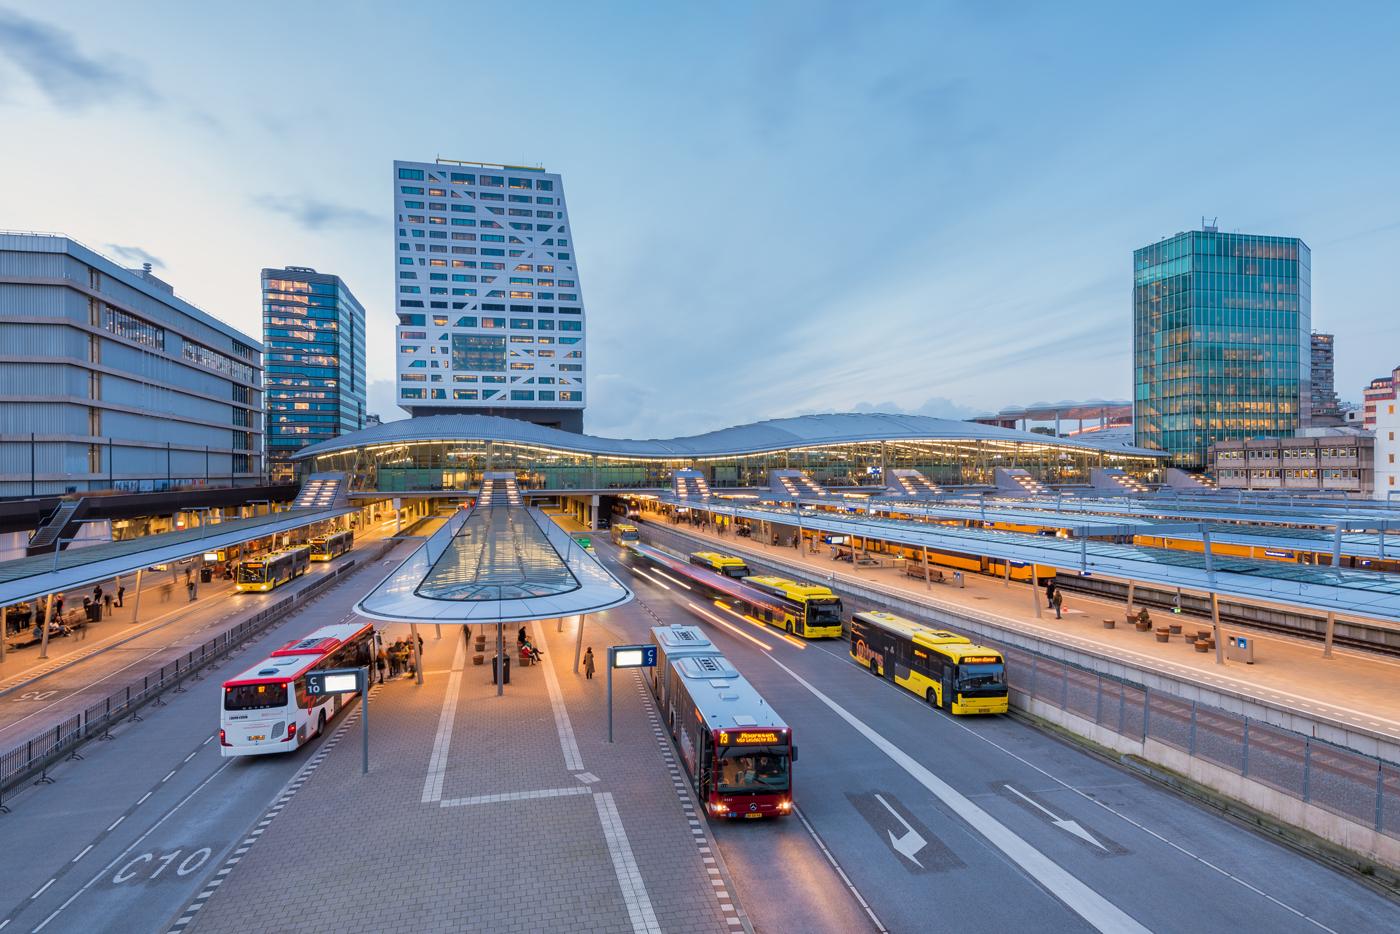 finance-openbaar-vervoer-utrecht